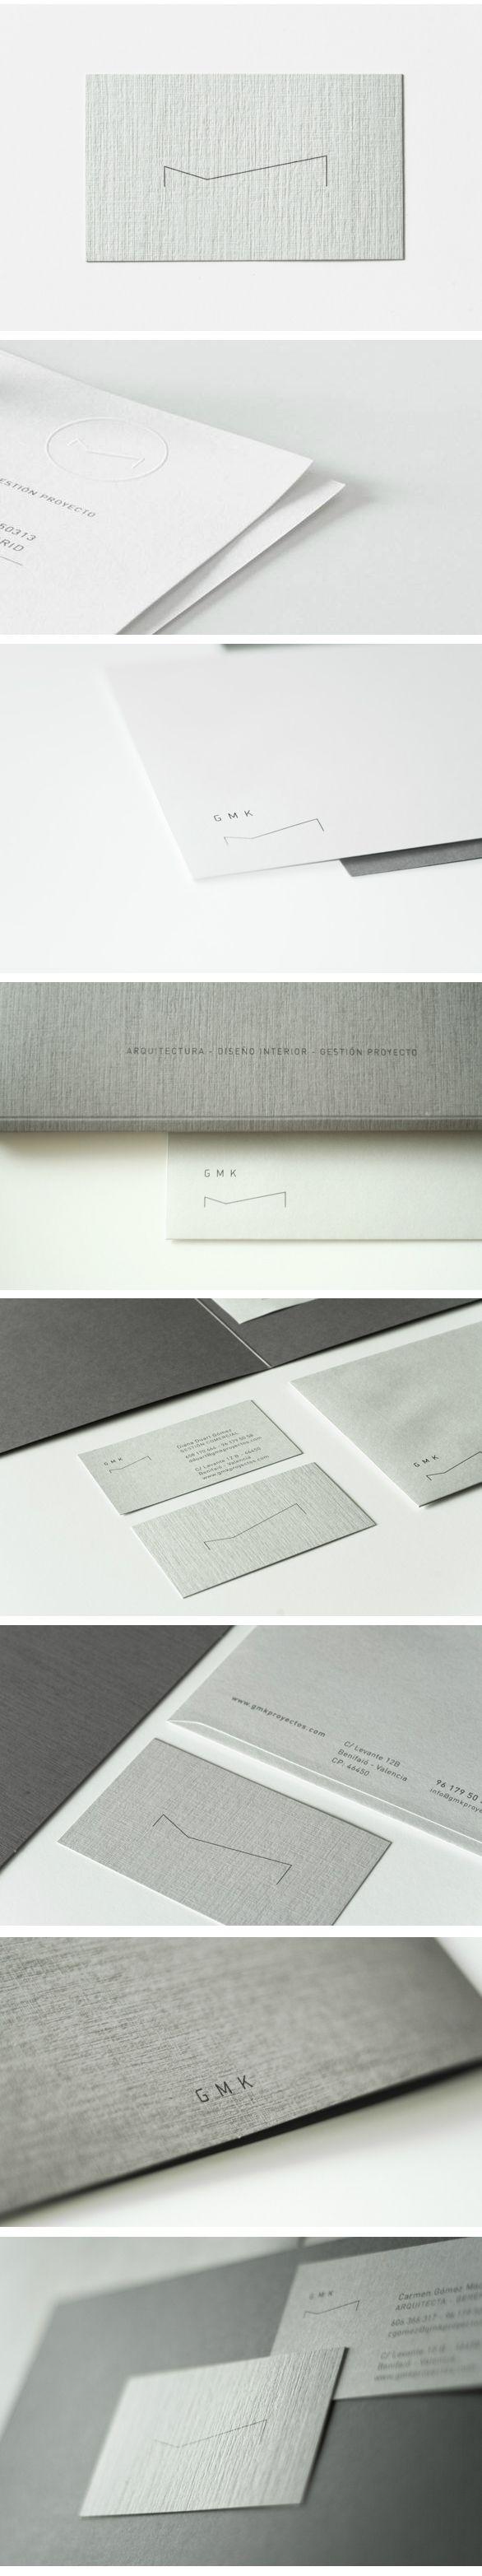 Brand Identity for GMK, architecture and interior design studio, by Alex Monzó via Behance